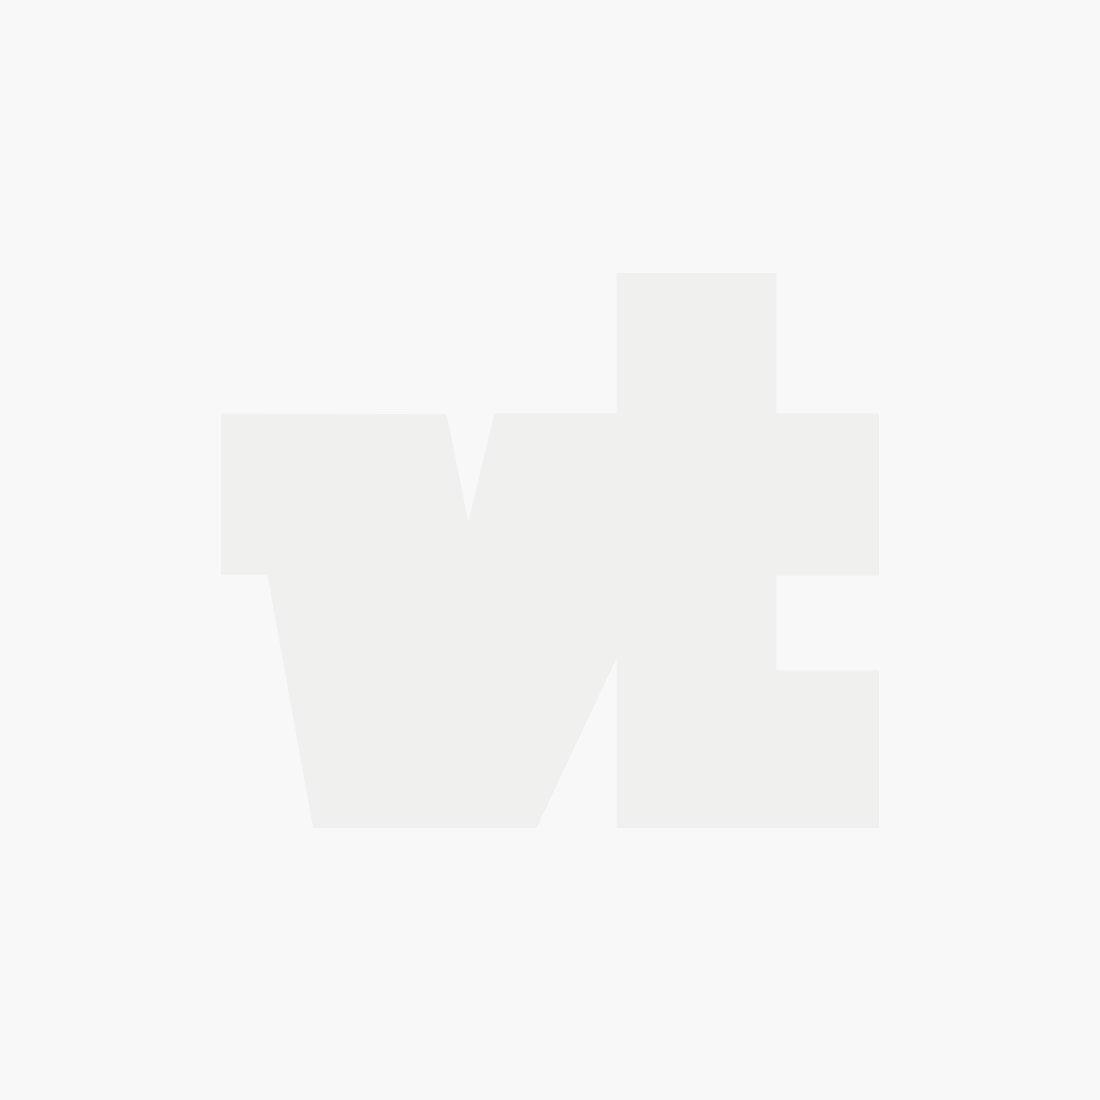 T-shirt short sleeves off-white